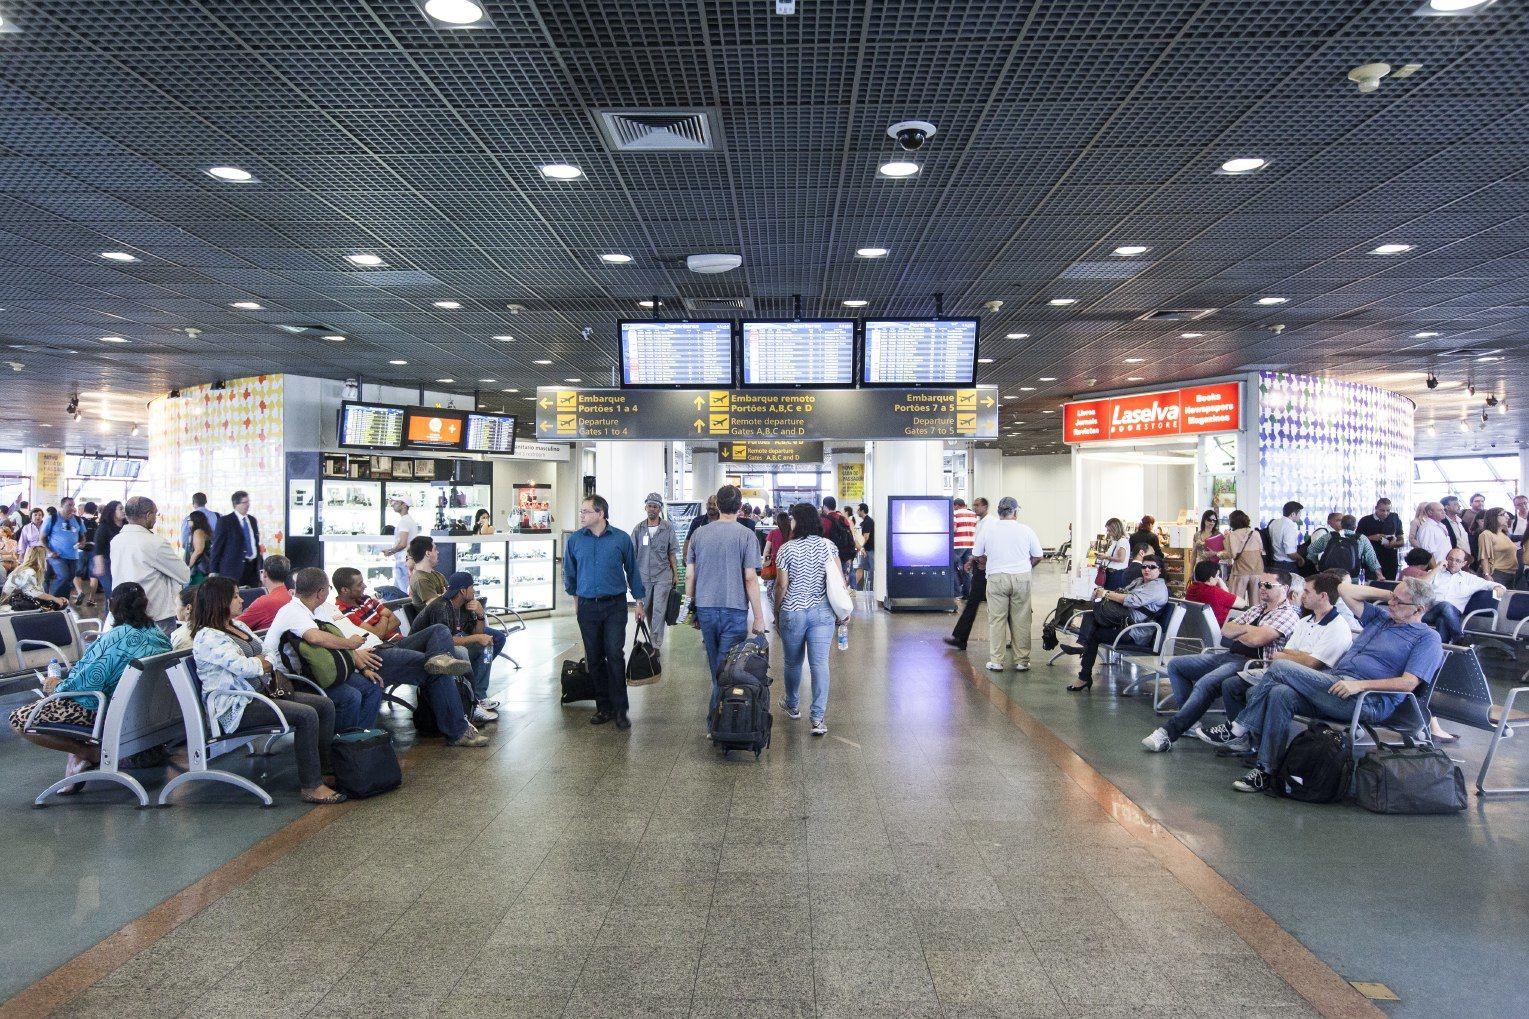 Aeroporto Juscelino Kubitschek : Rota brasília boa vista será novidade da tam a partir de